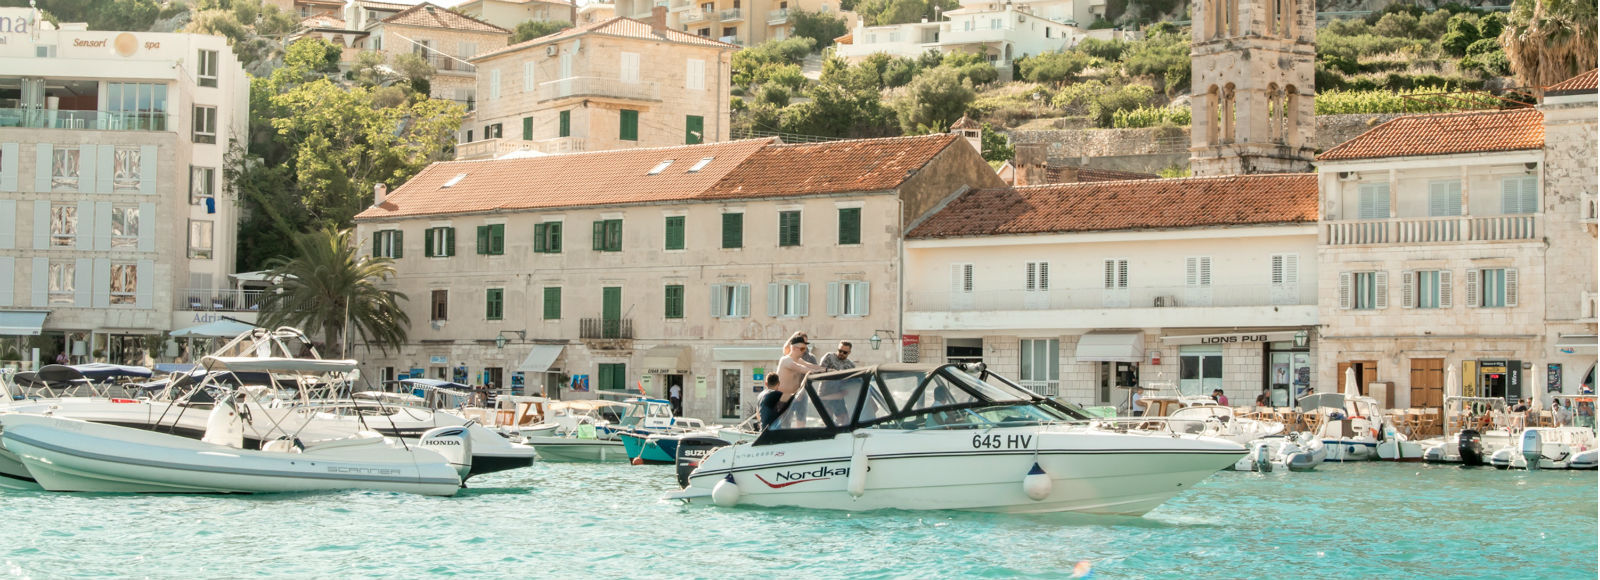 Kroatien fkk inseln urlaub Mit Karte!